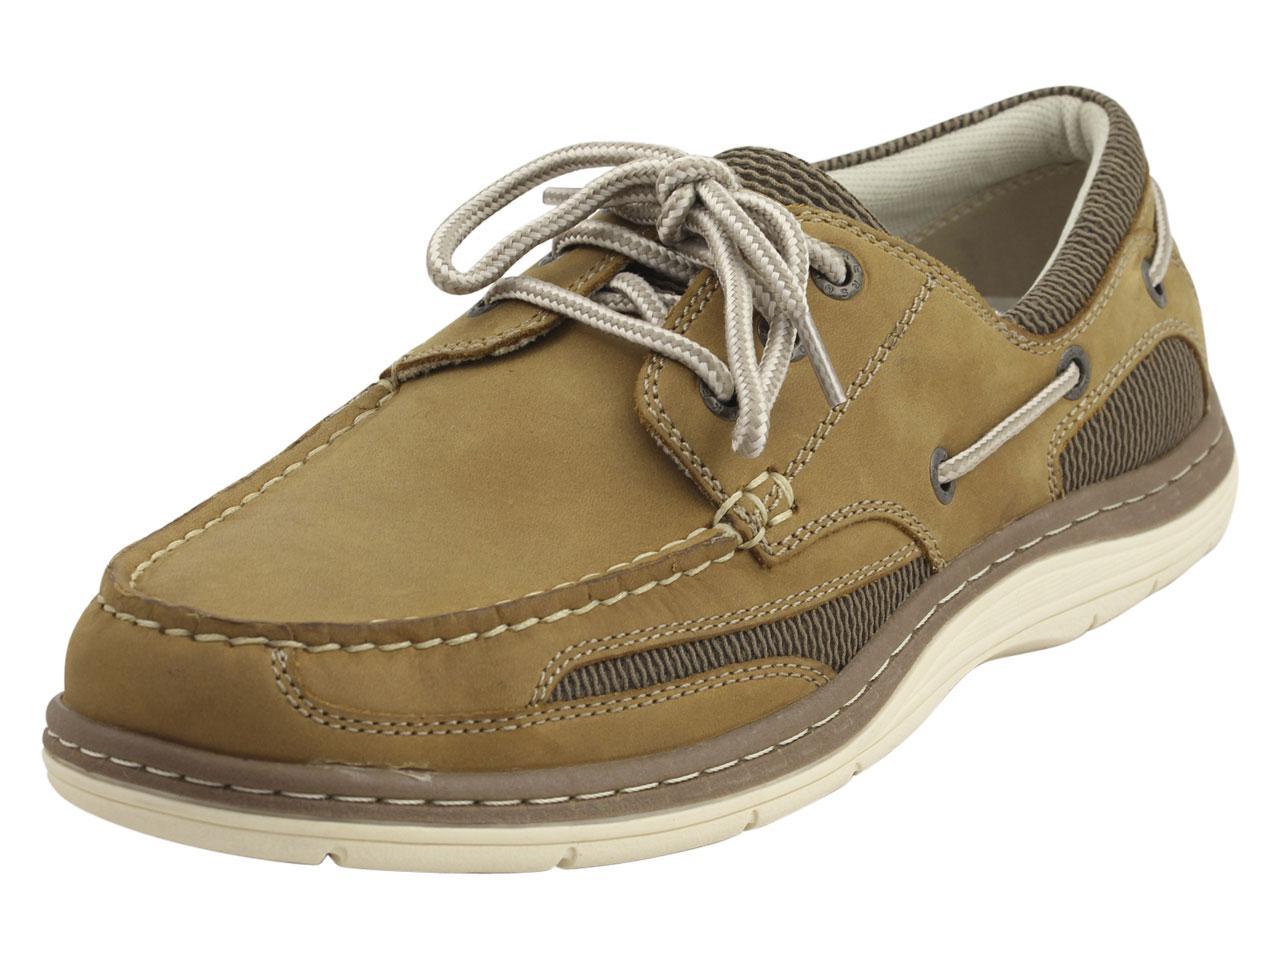 Image of Dockers Men's Lakeport Memory Foam Loafers Boat Shoes - Brown - 10.5 D(M) US